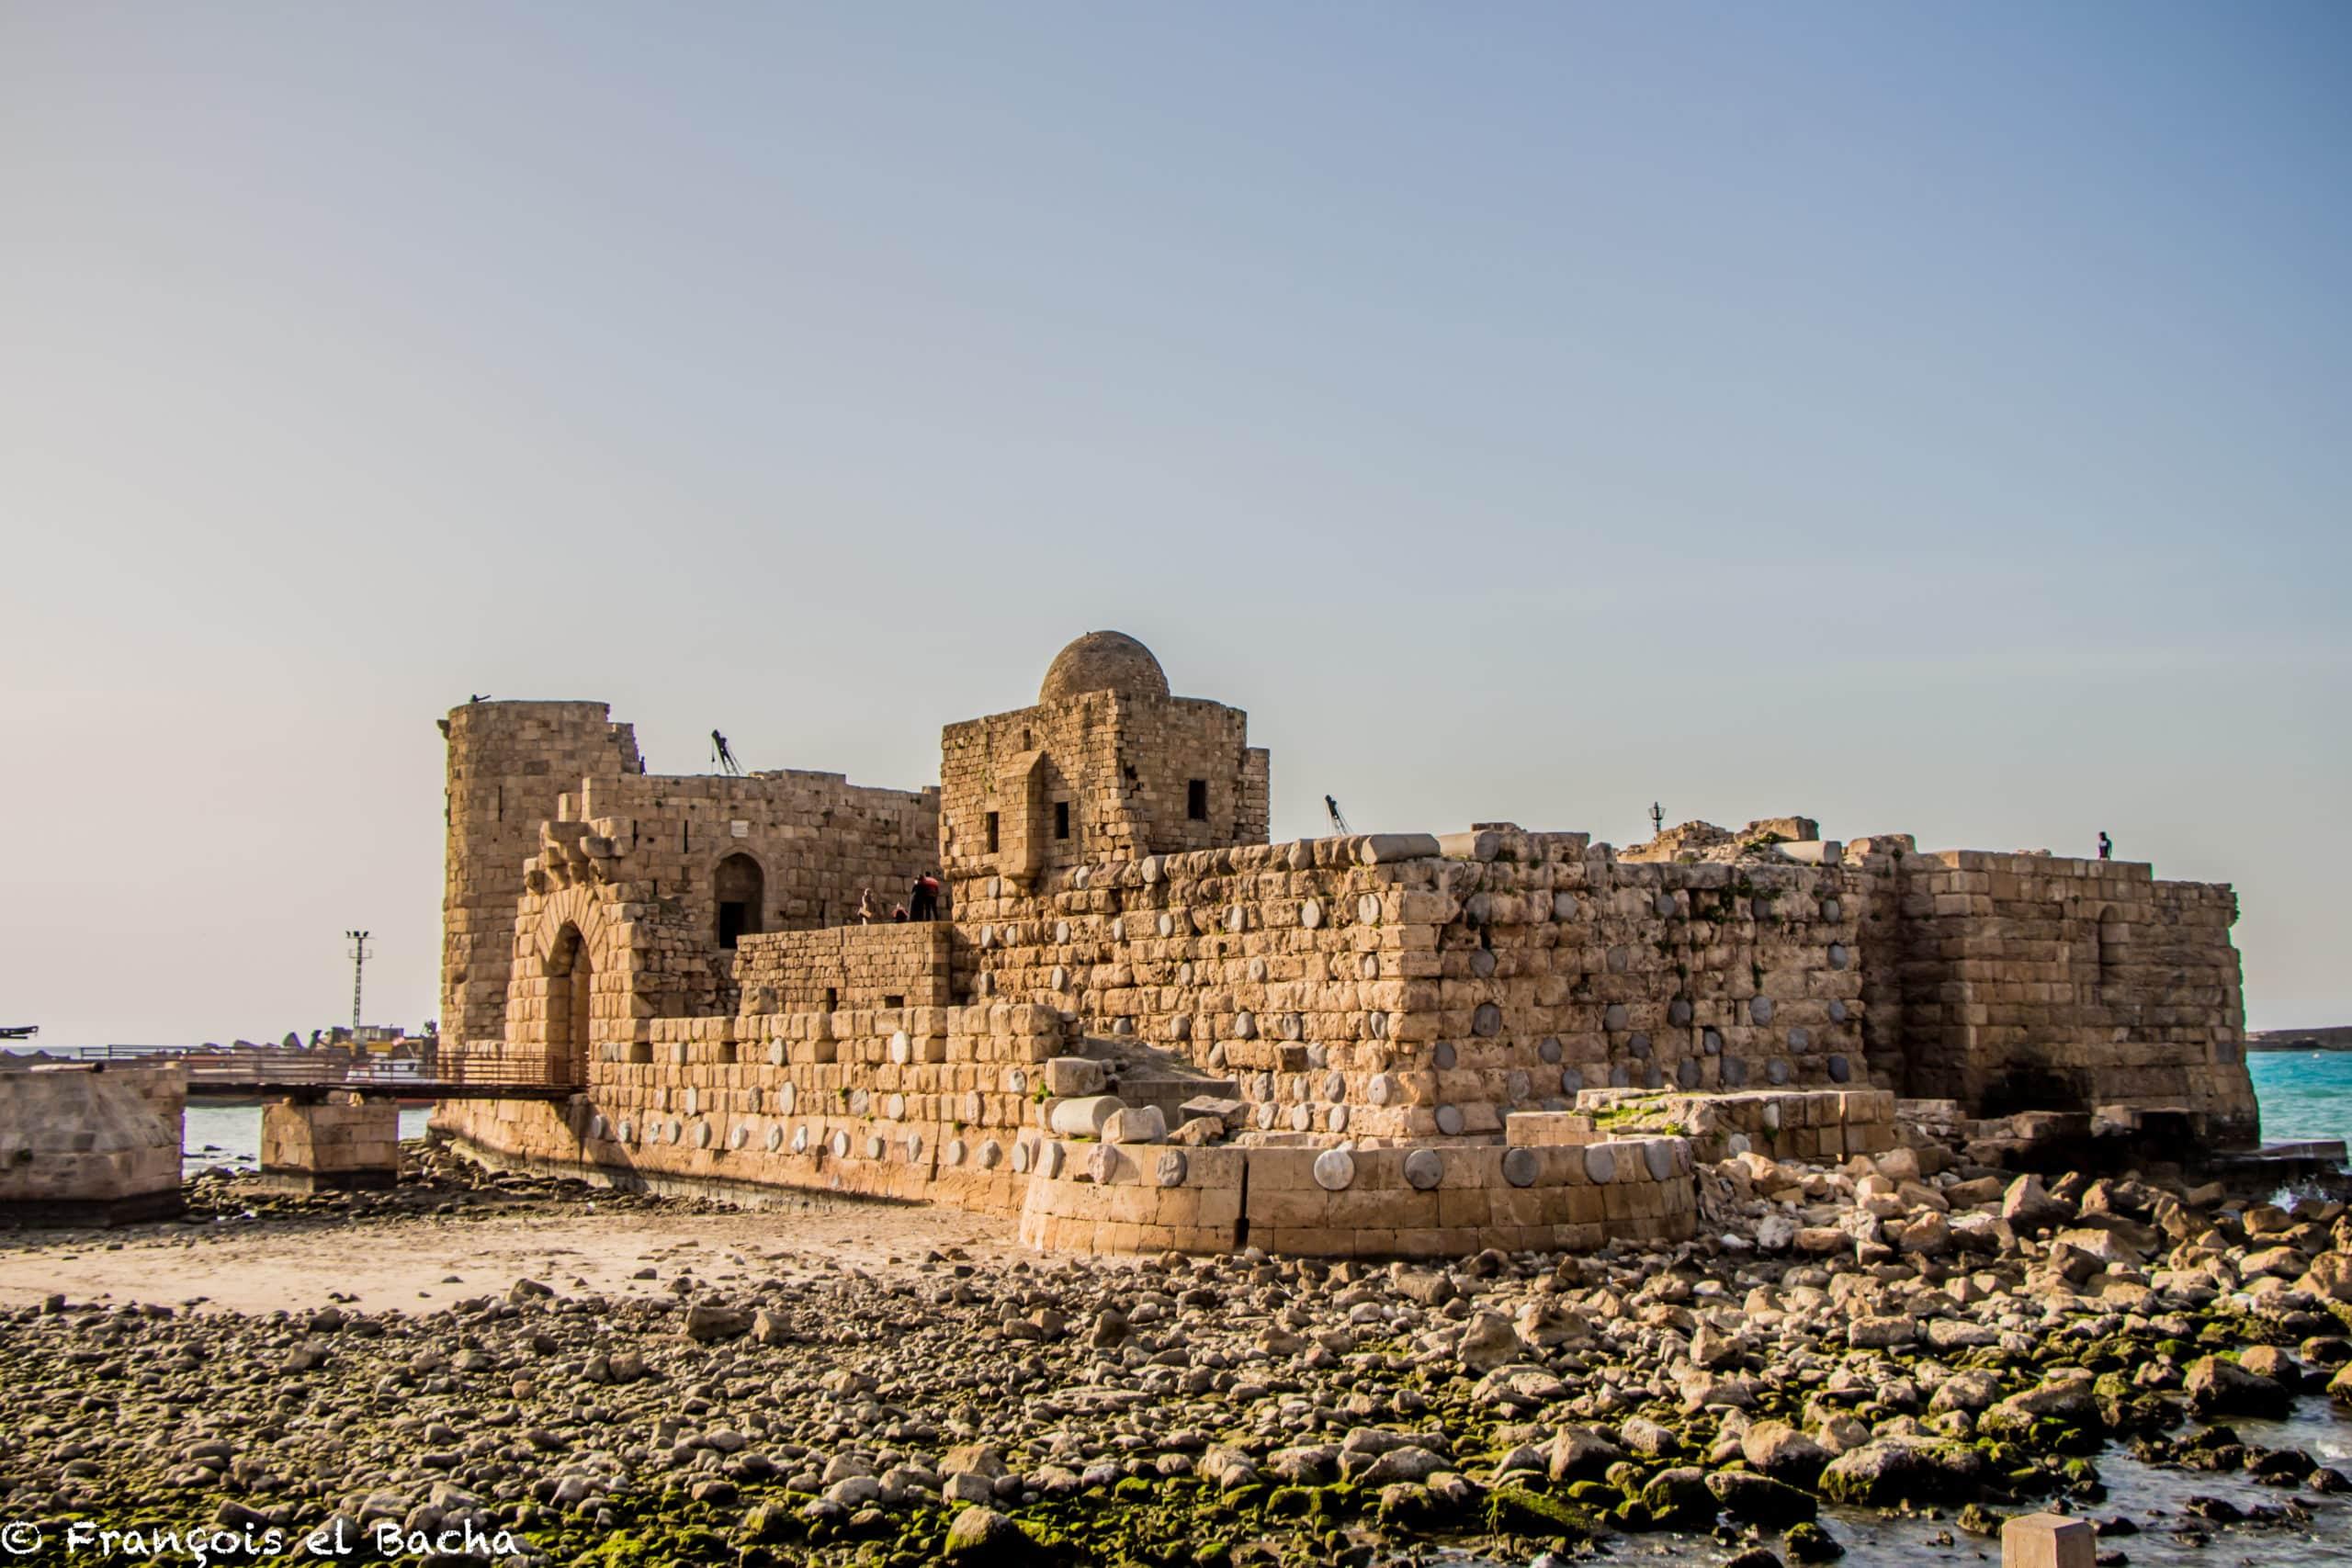 Le Château de la Mer, Saïda, Sud Liban. Crédit Photo: François el Bacha